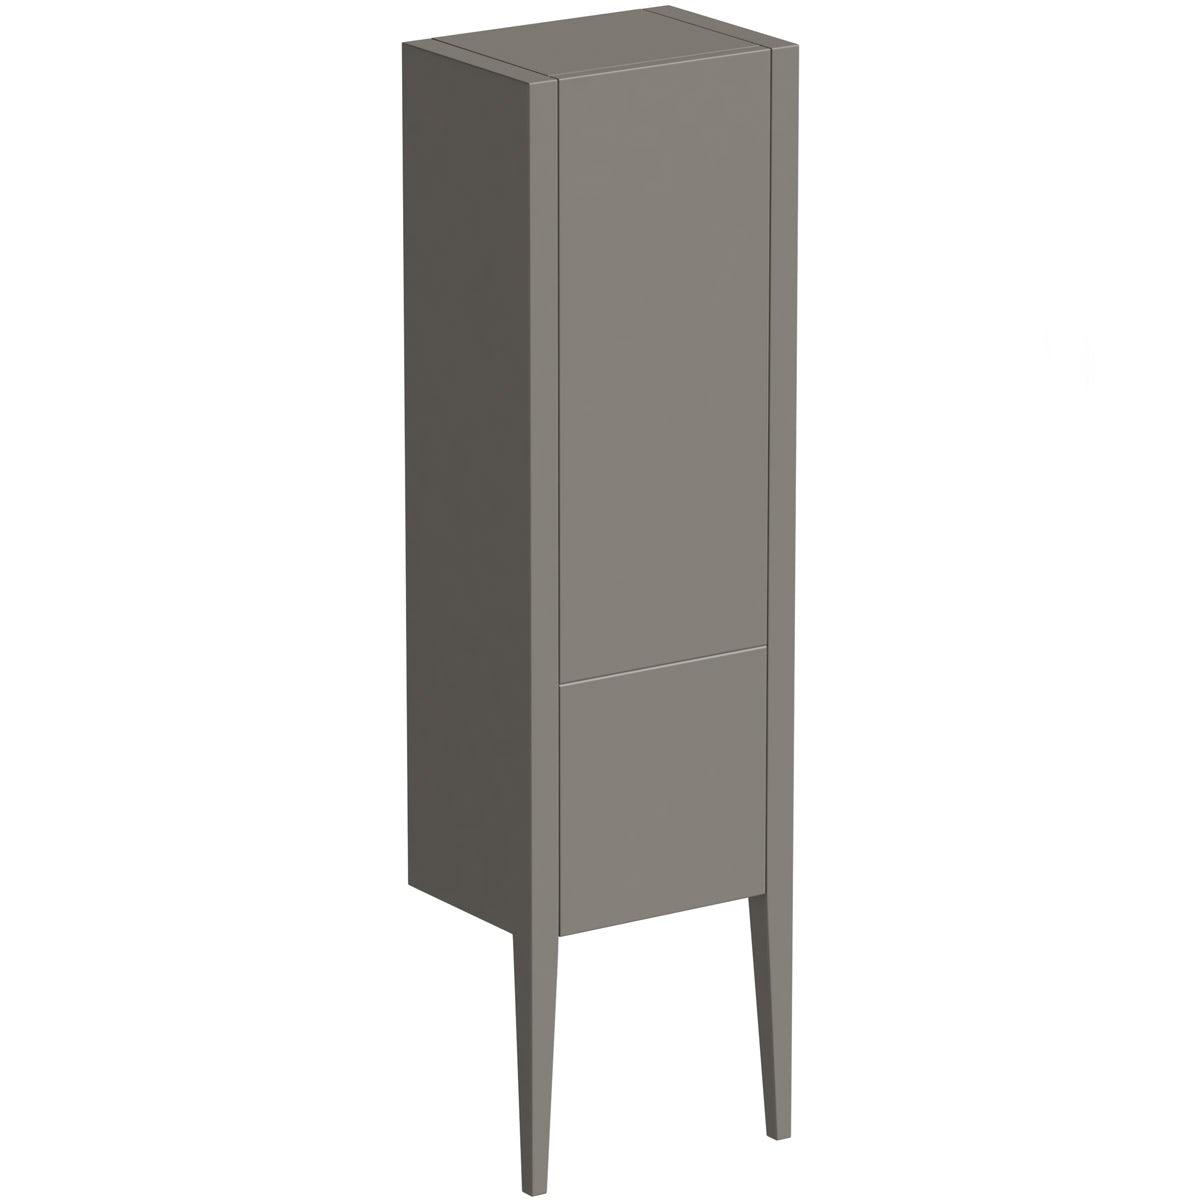 Mode Hale greystone matt storage cabinet